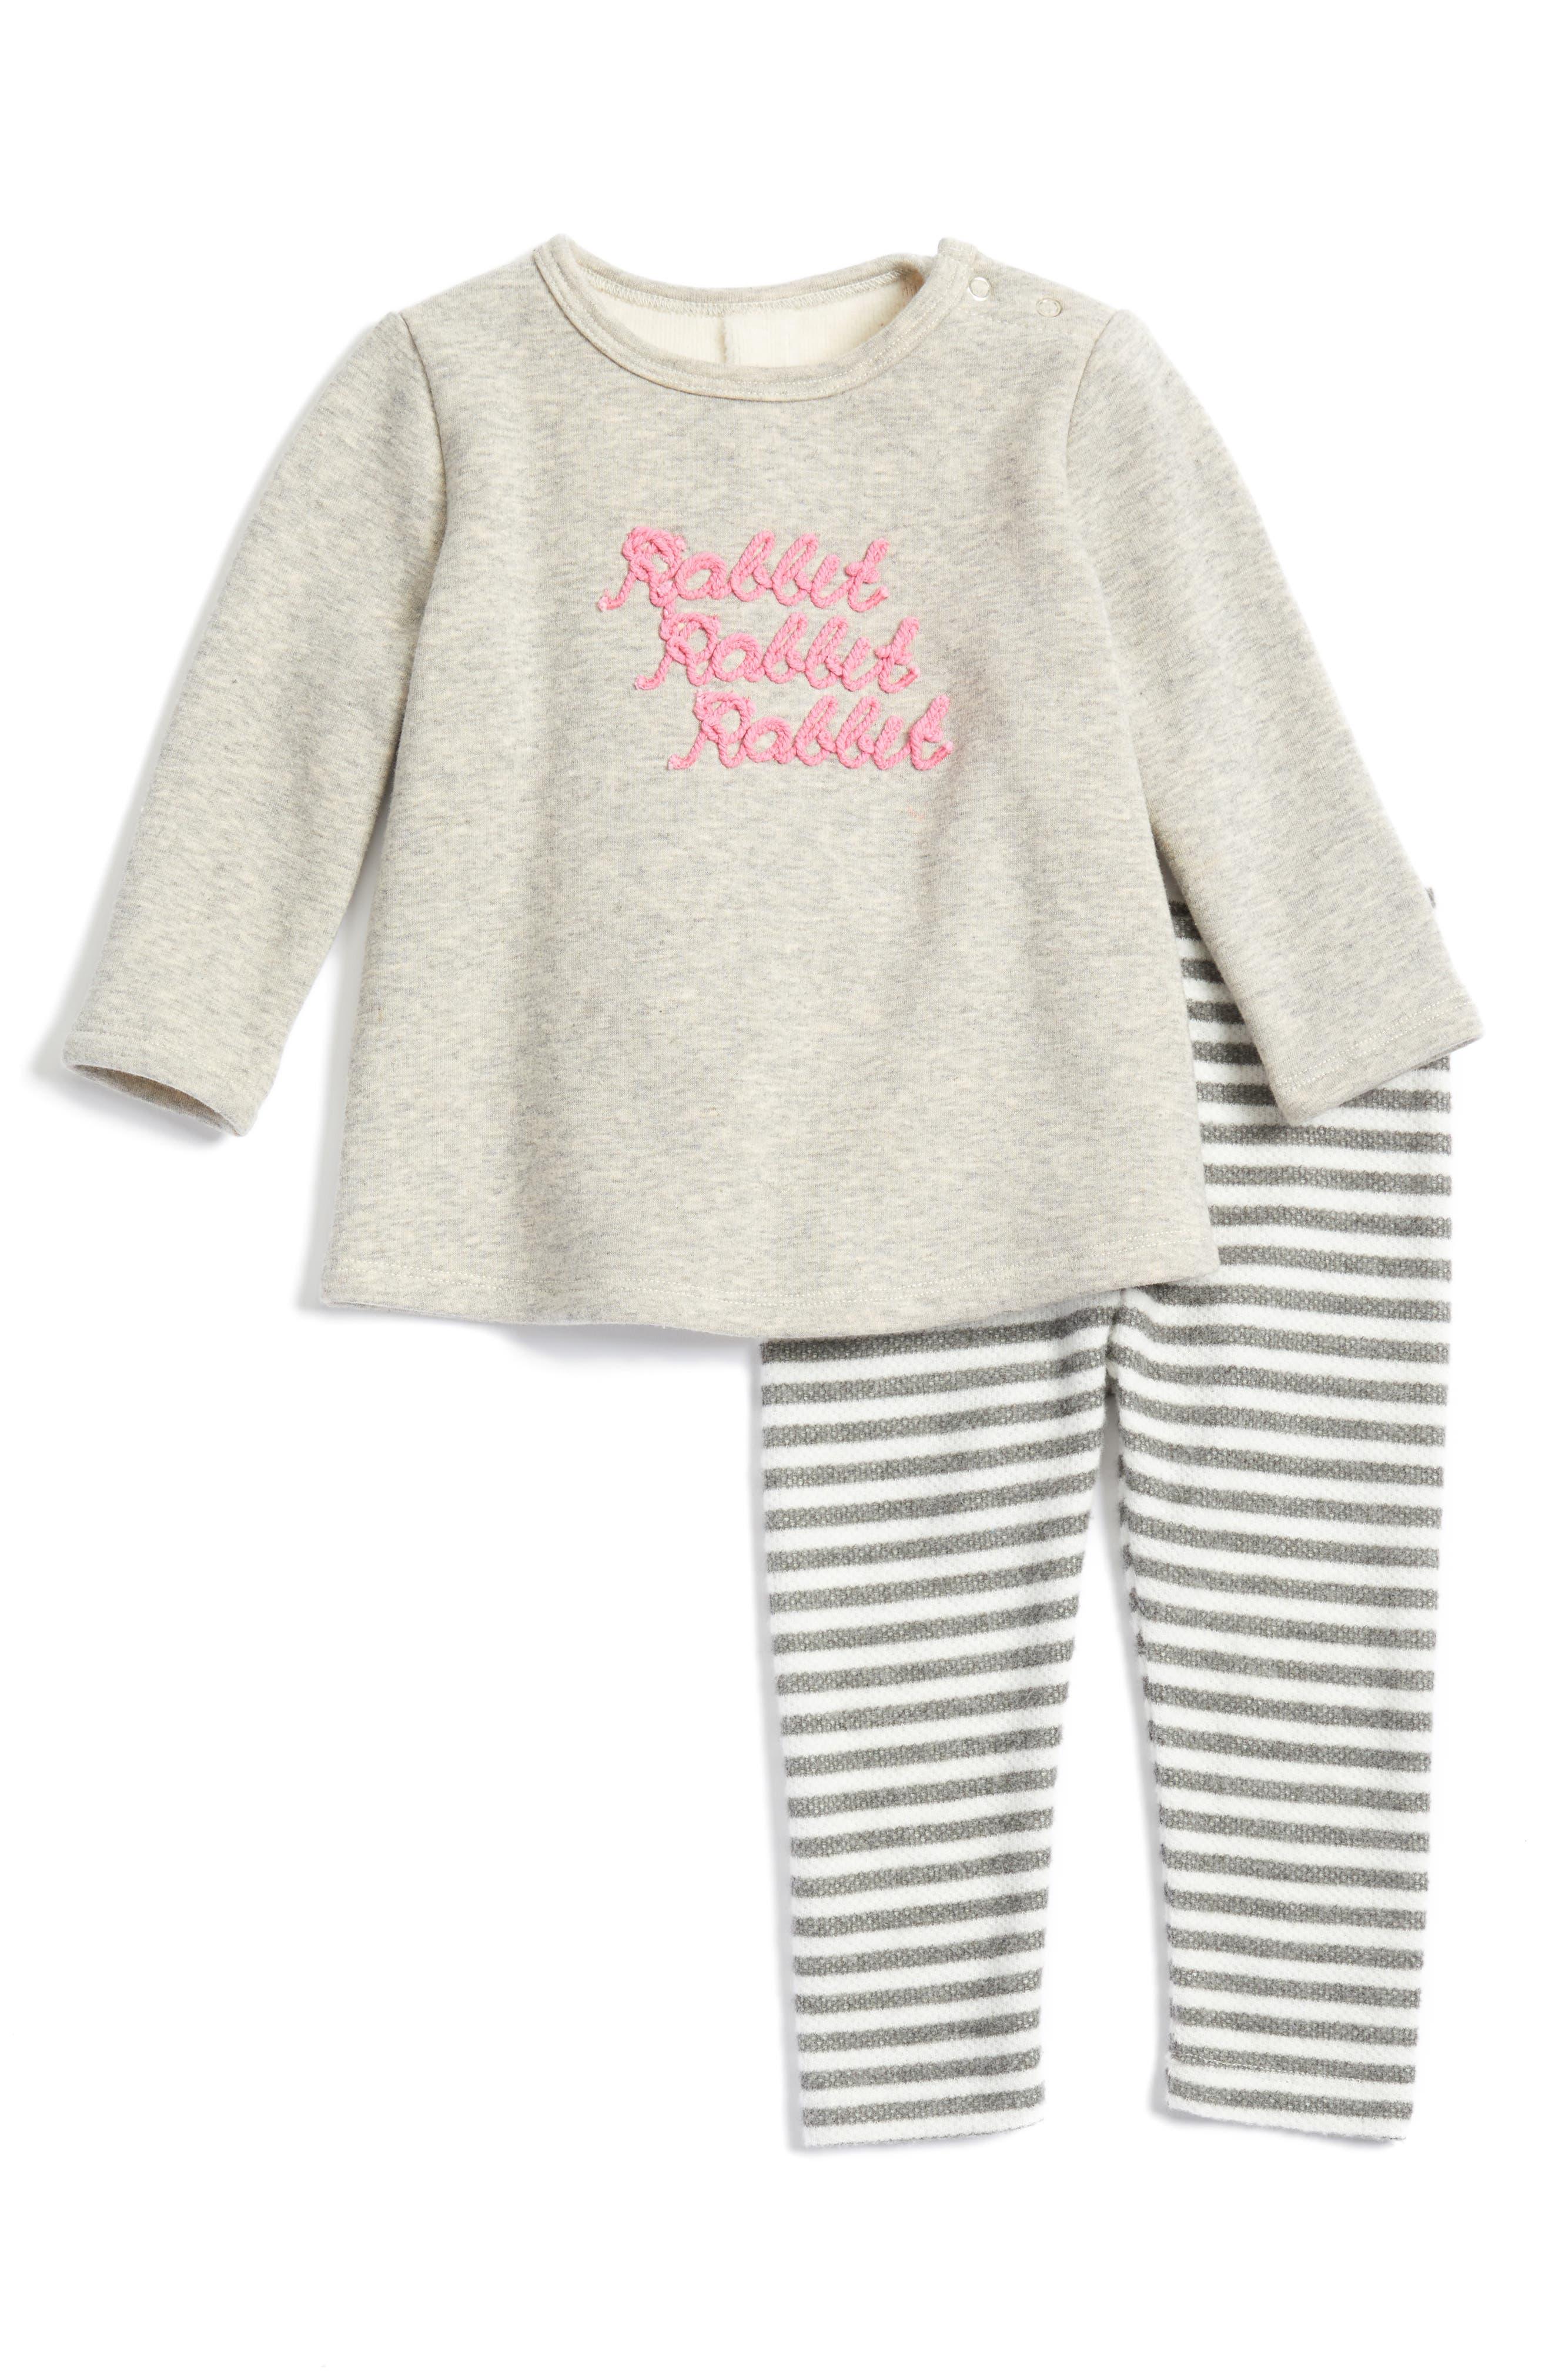 Main Image - Nordstrom Baby Fleece Tunic & Leggings Set (Baby Girls)